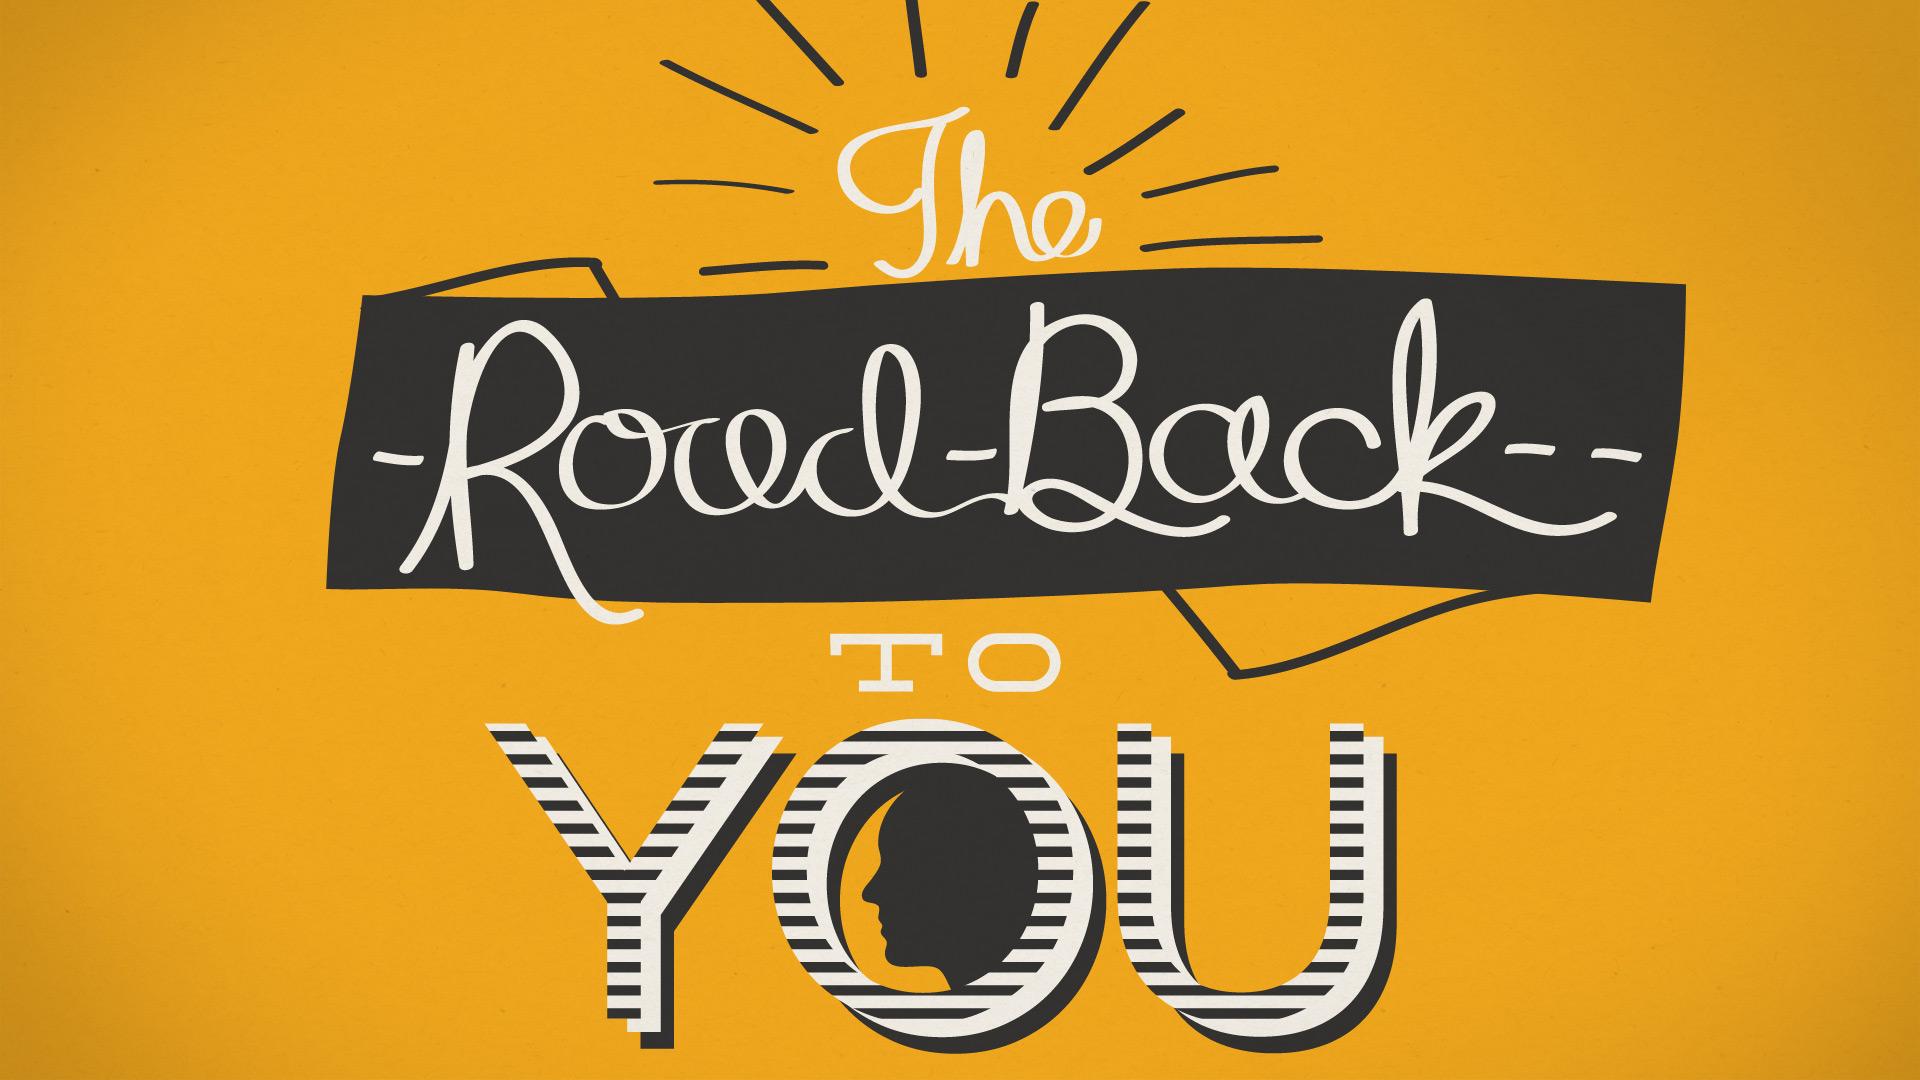 Road-Back_Series-Title.jpg